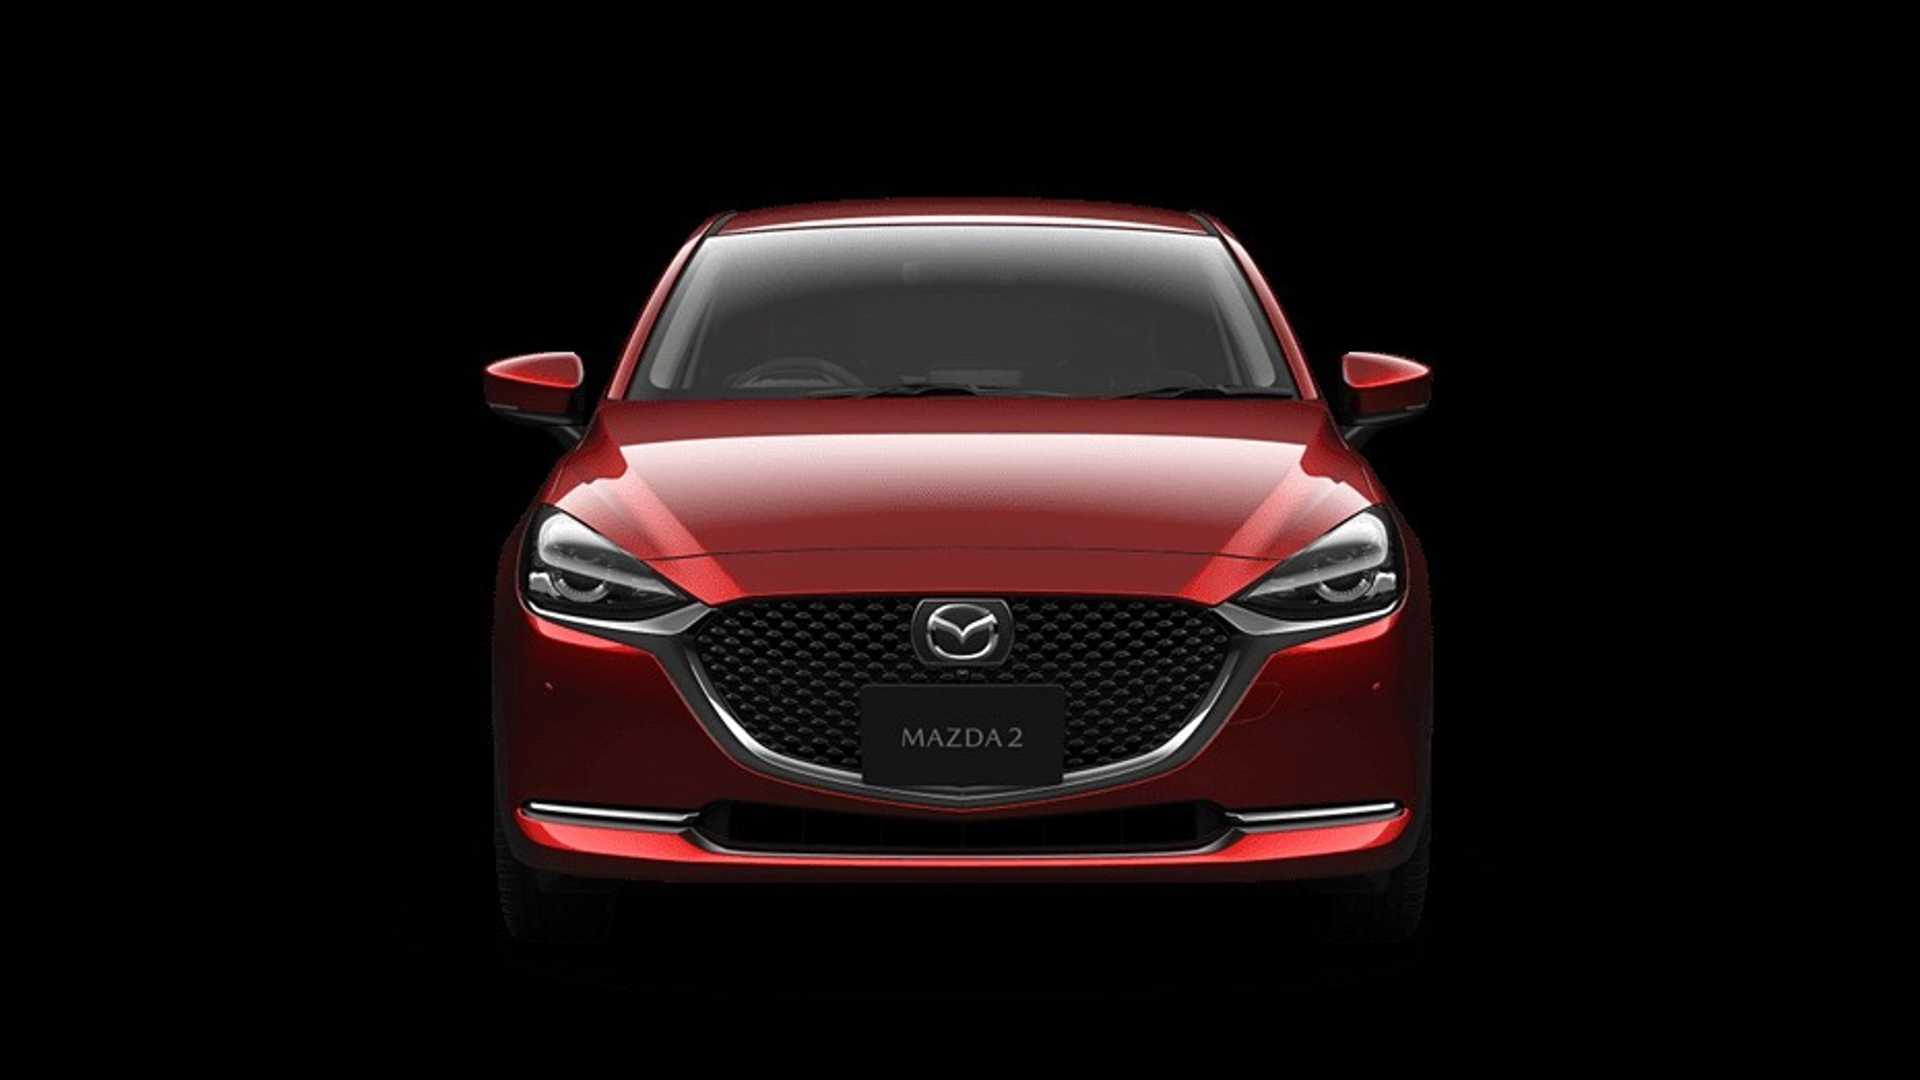 New Ford Focus Becomes LG Brand Ambassador Team Vehicle - autoevolution